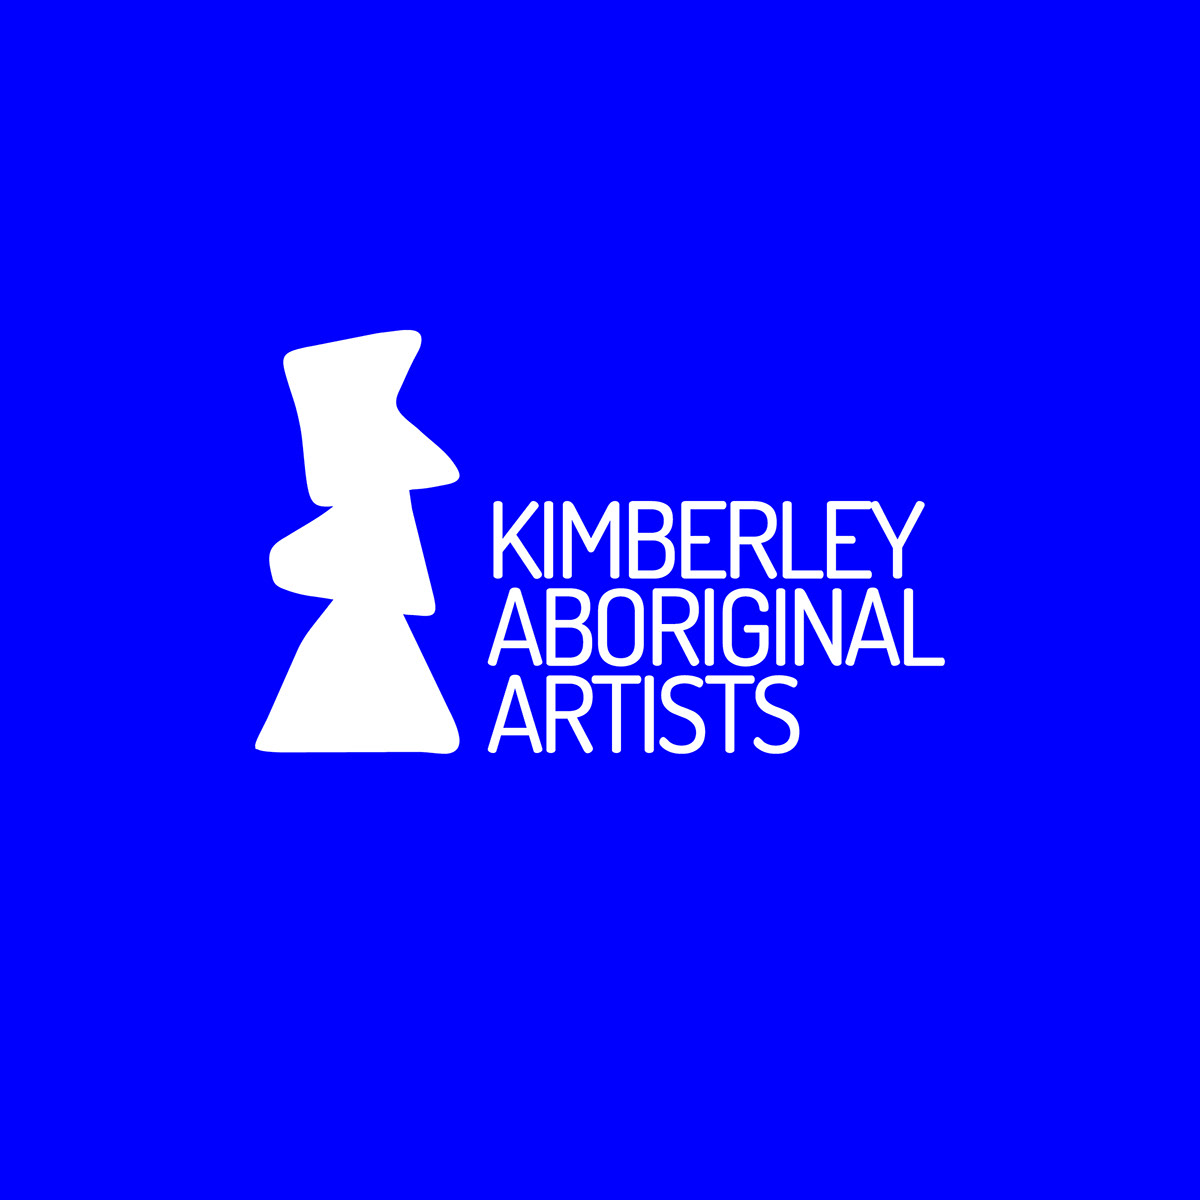 Aboriginal Art art direction  Australia brand Brand Indentity branding  designer graphic design  indigenous logo